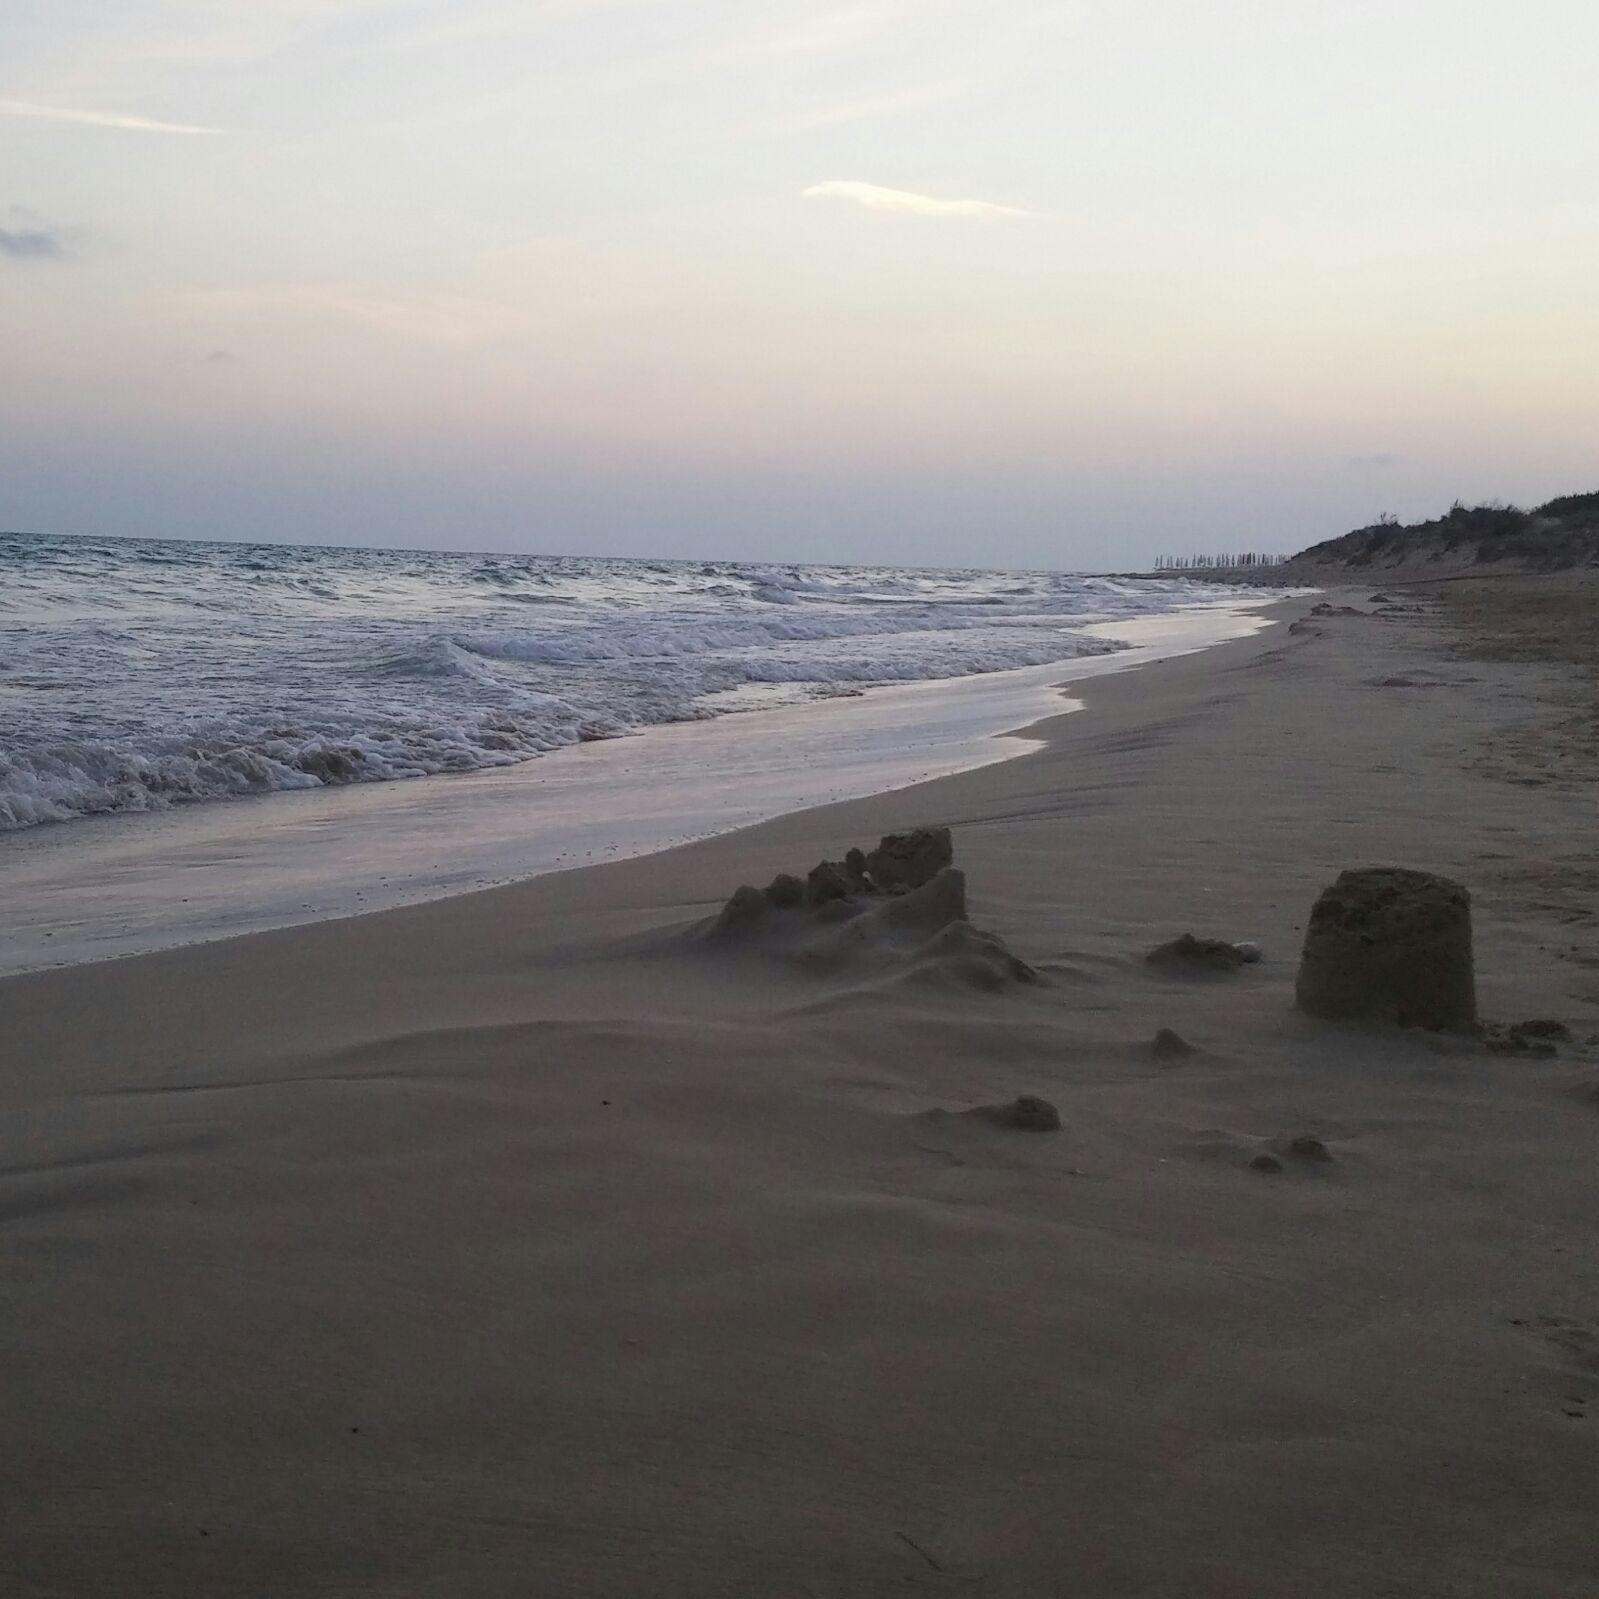 spiagge salentine (matilda qose)